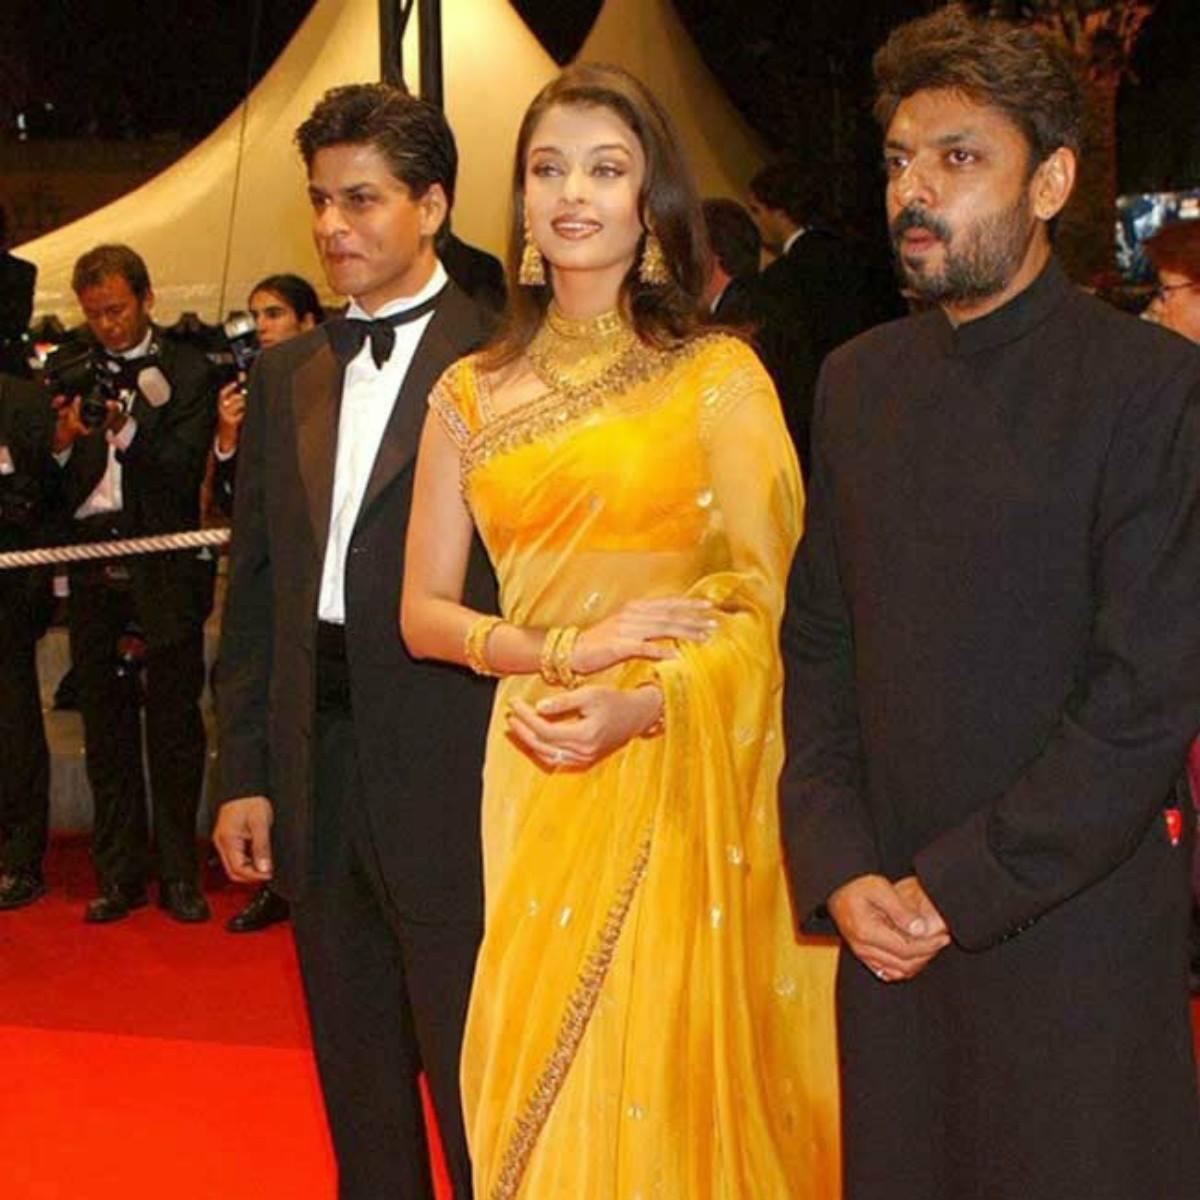 She made her Cannes debut alongside Shah Rukh Khan.